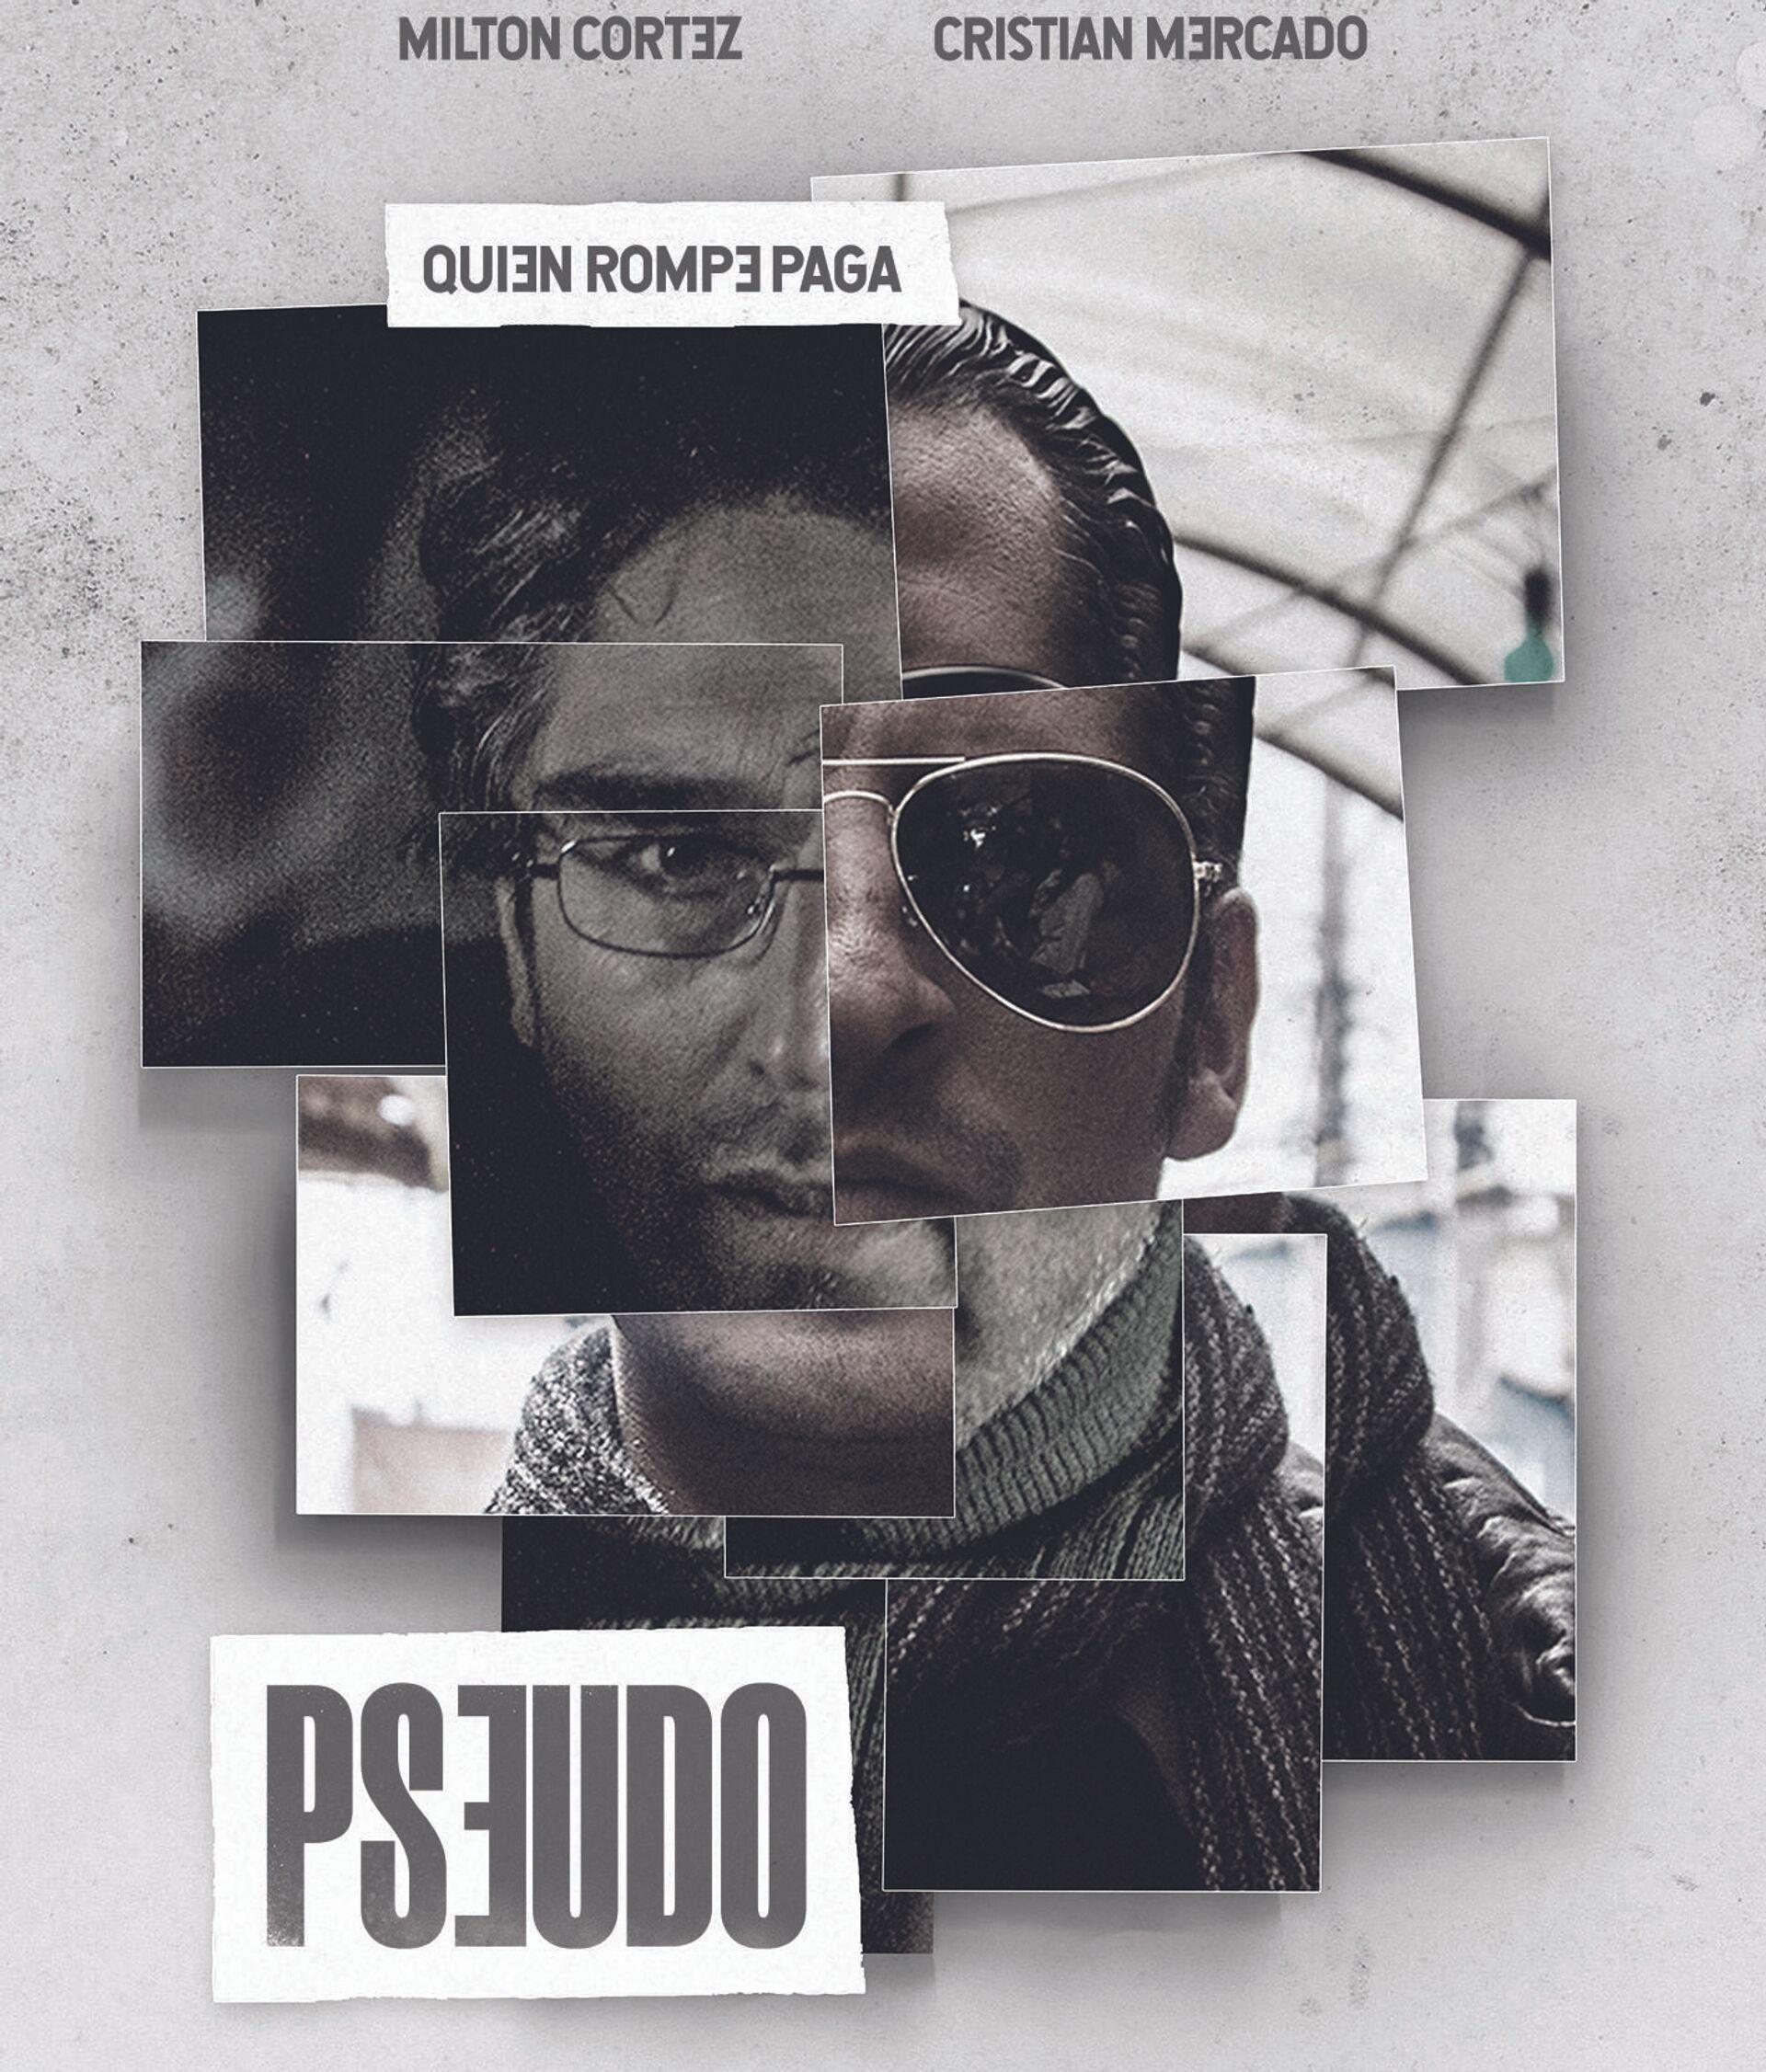 Póster de la película boliviana 'Pseudo' - Sputnik Mundo, 1920, 22.07.2021